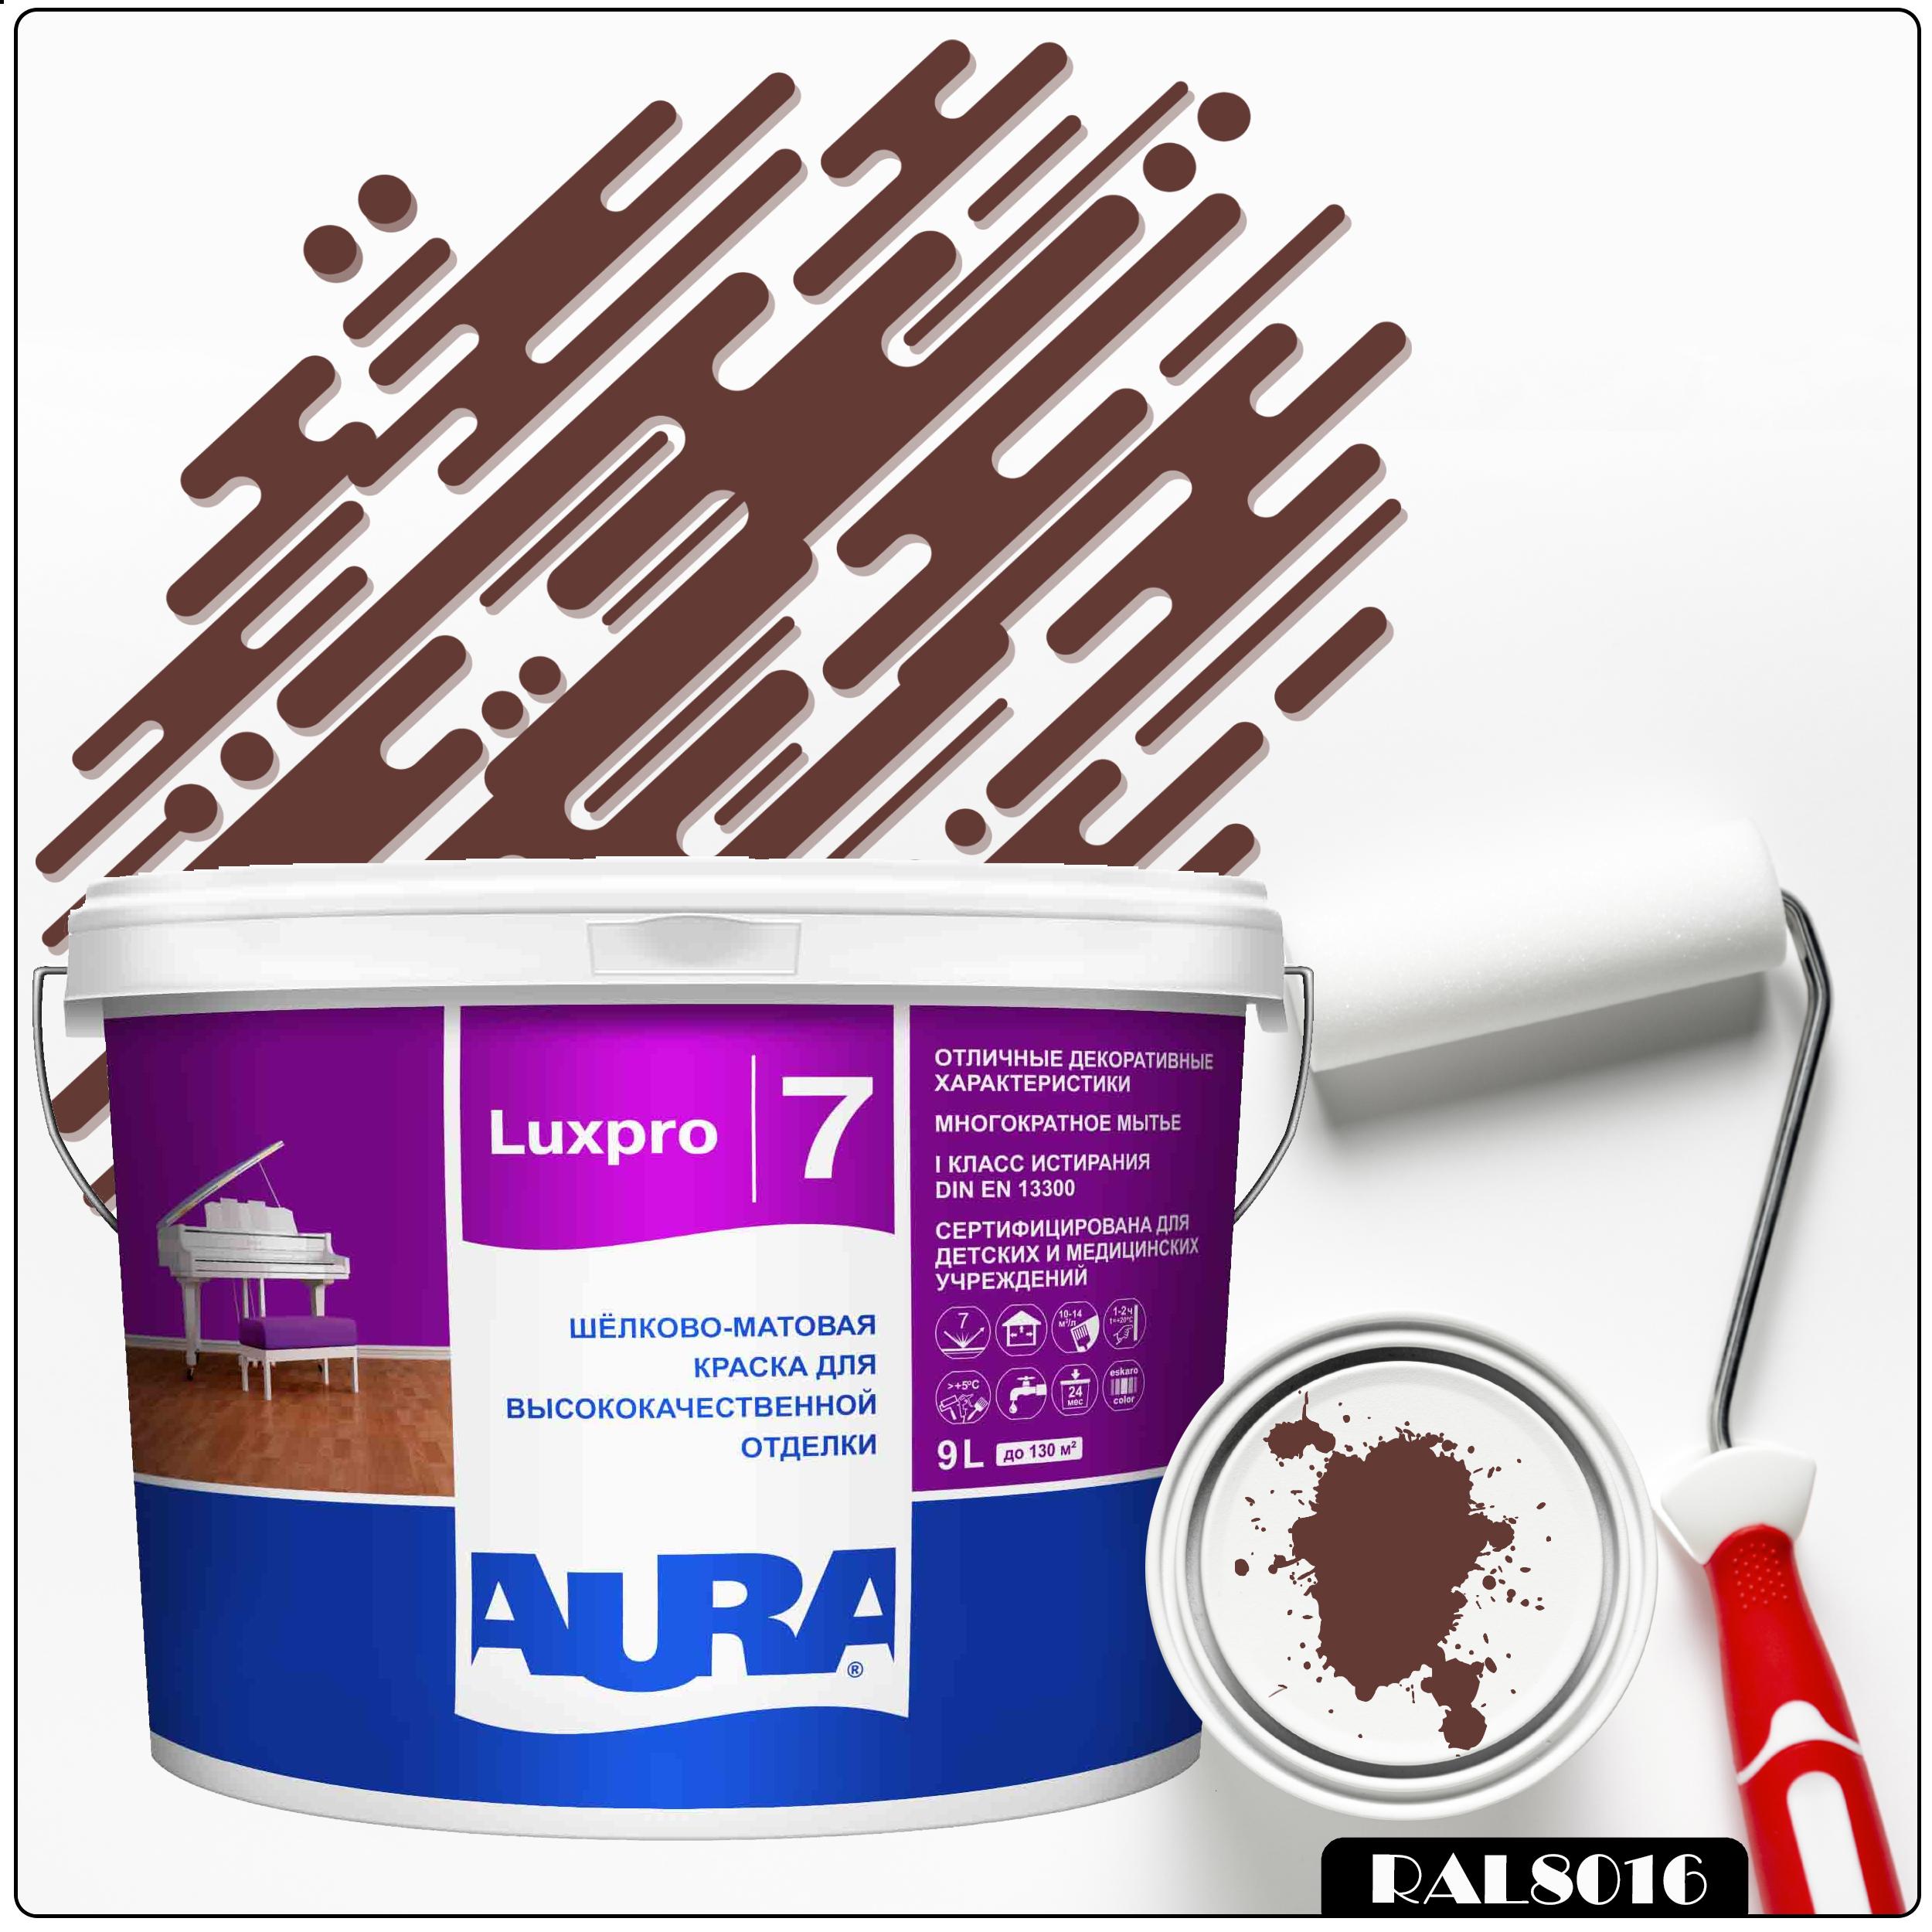 Фото 12 - Краска Aura LuxPRO 7, RAL 8016 Коричневый махагон, латексная, шелково-матовая, интерьерная, 9л, Аура.